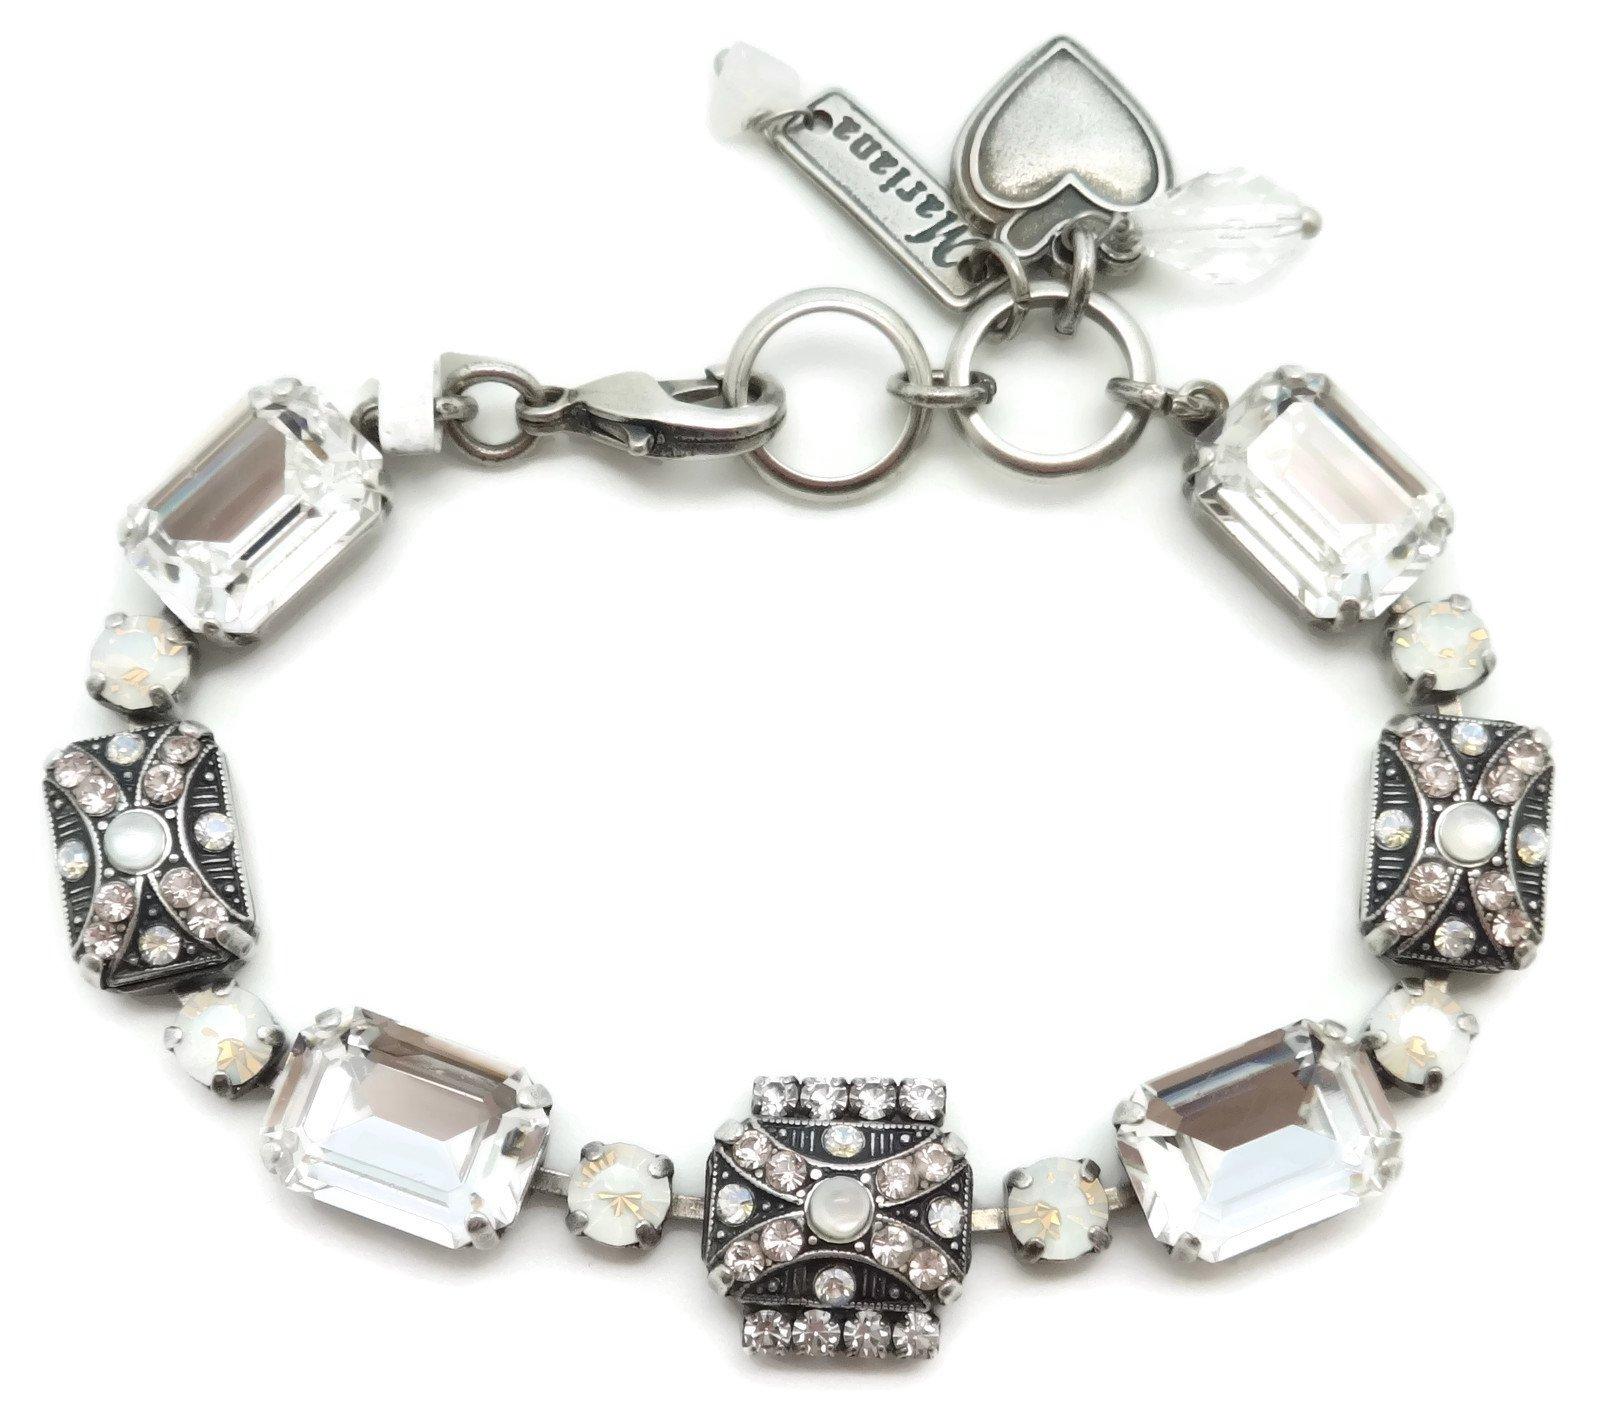 Mariana Swarovski Crystal Silver Plated Bracelet Clear Rectangle Mosaic 1078 Africa Kalahari